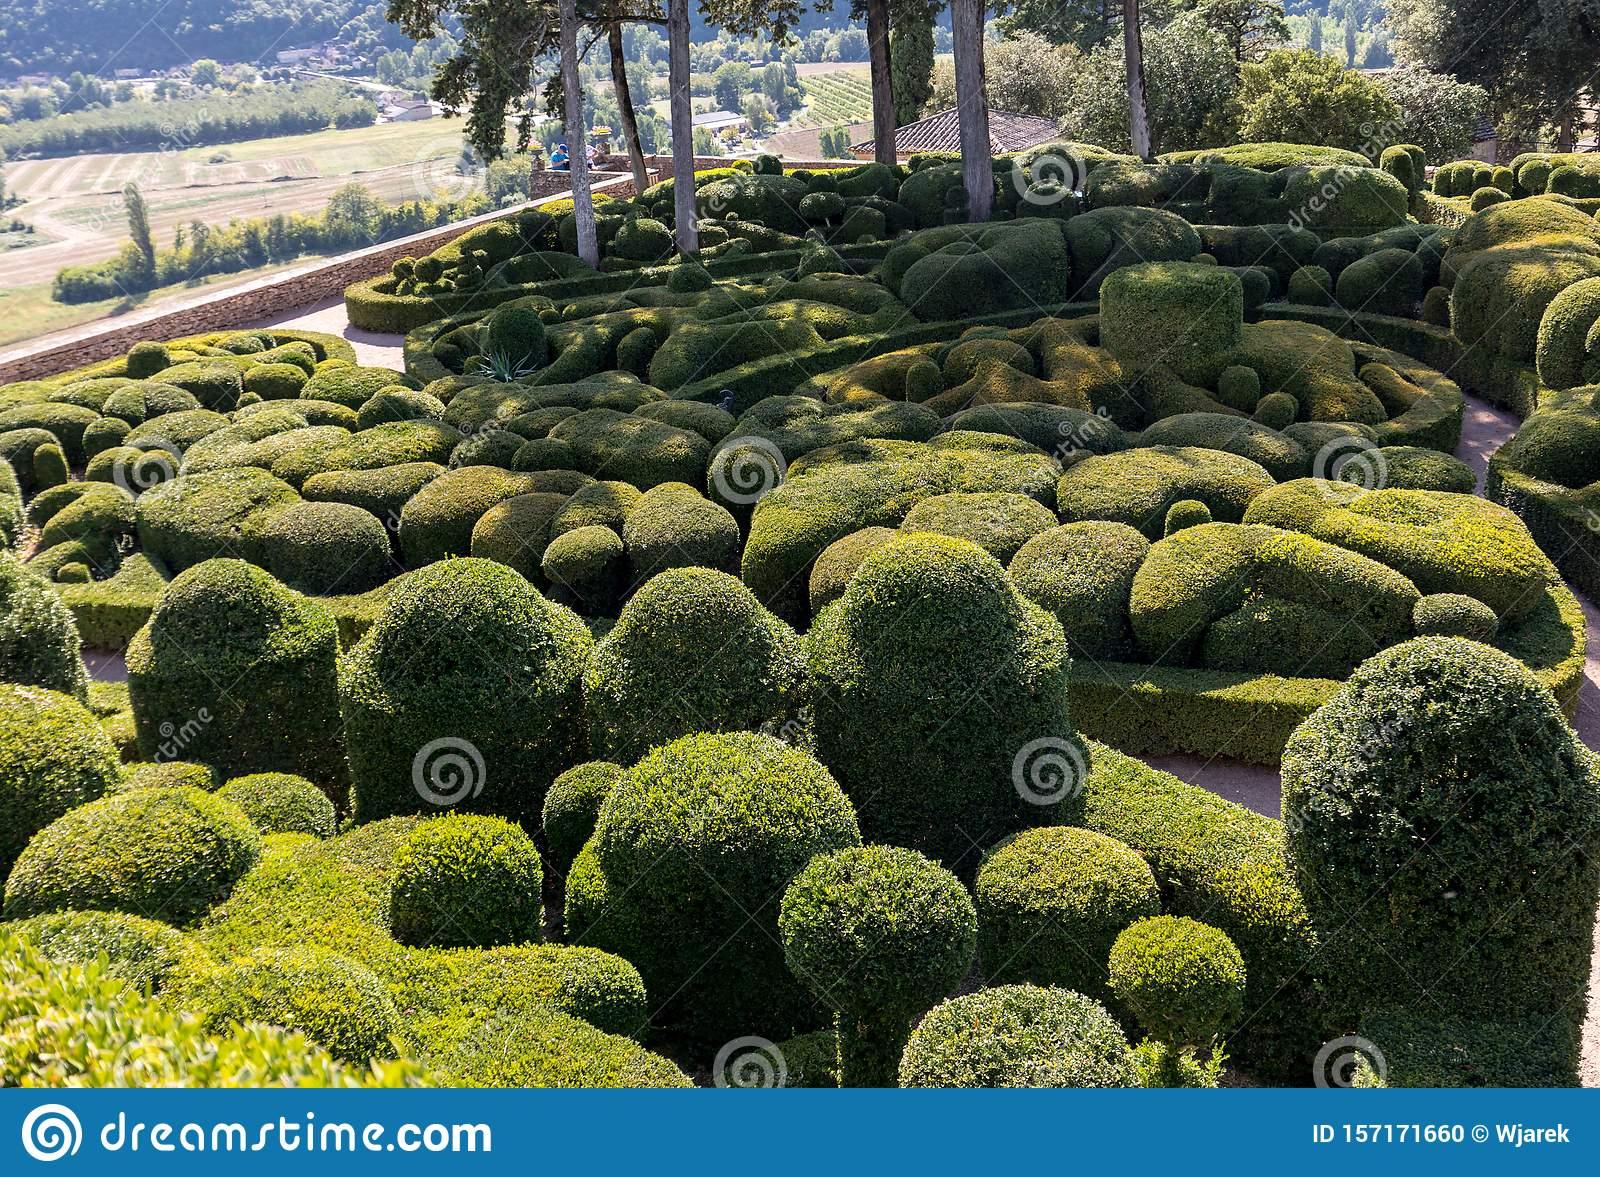 dordogne france september topiary gardens jardins de marqueyssac dordogne region france topiary